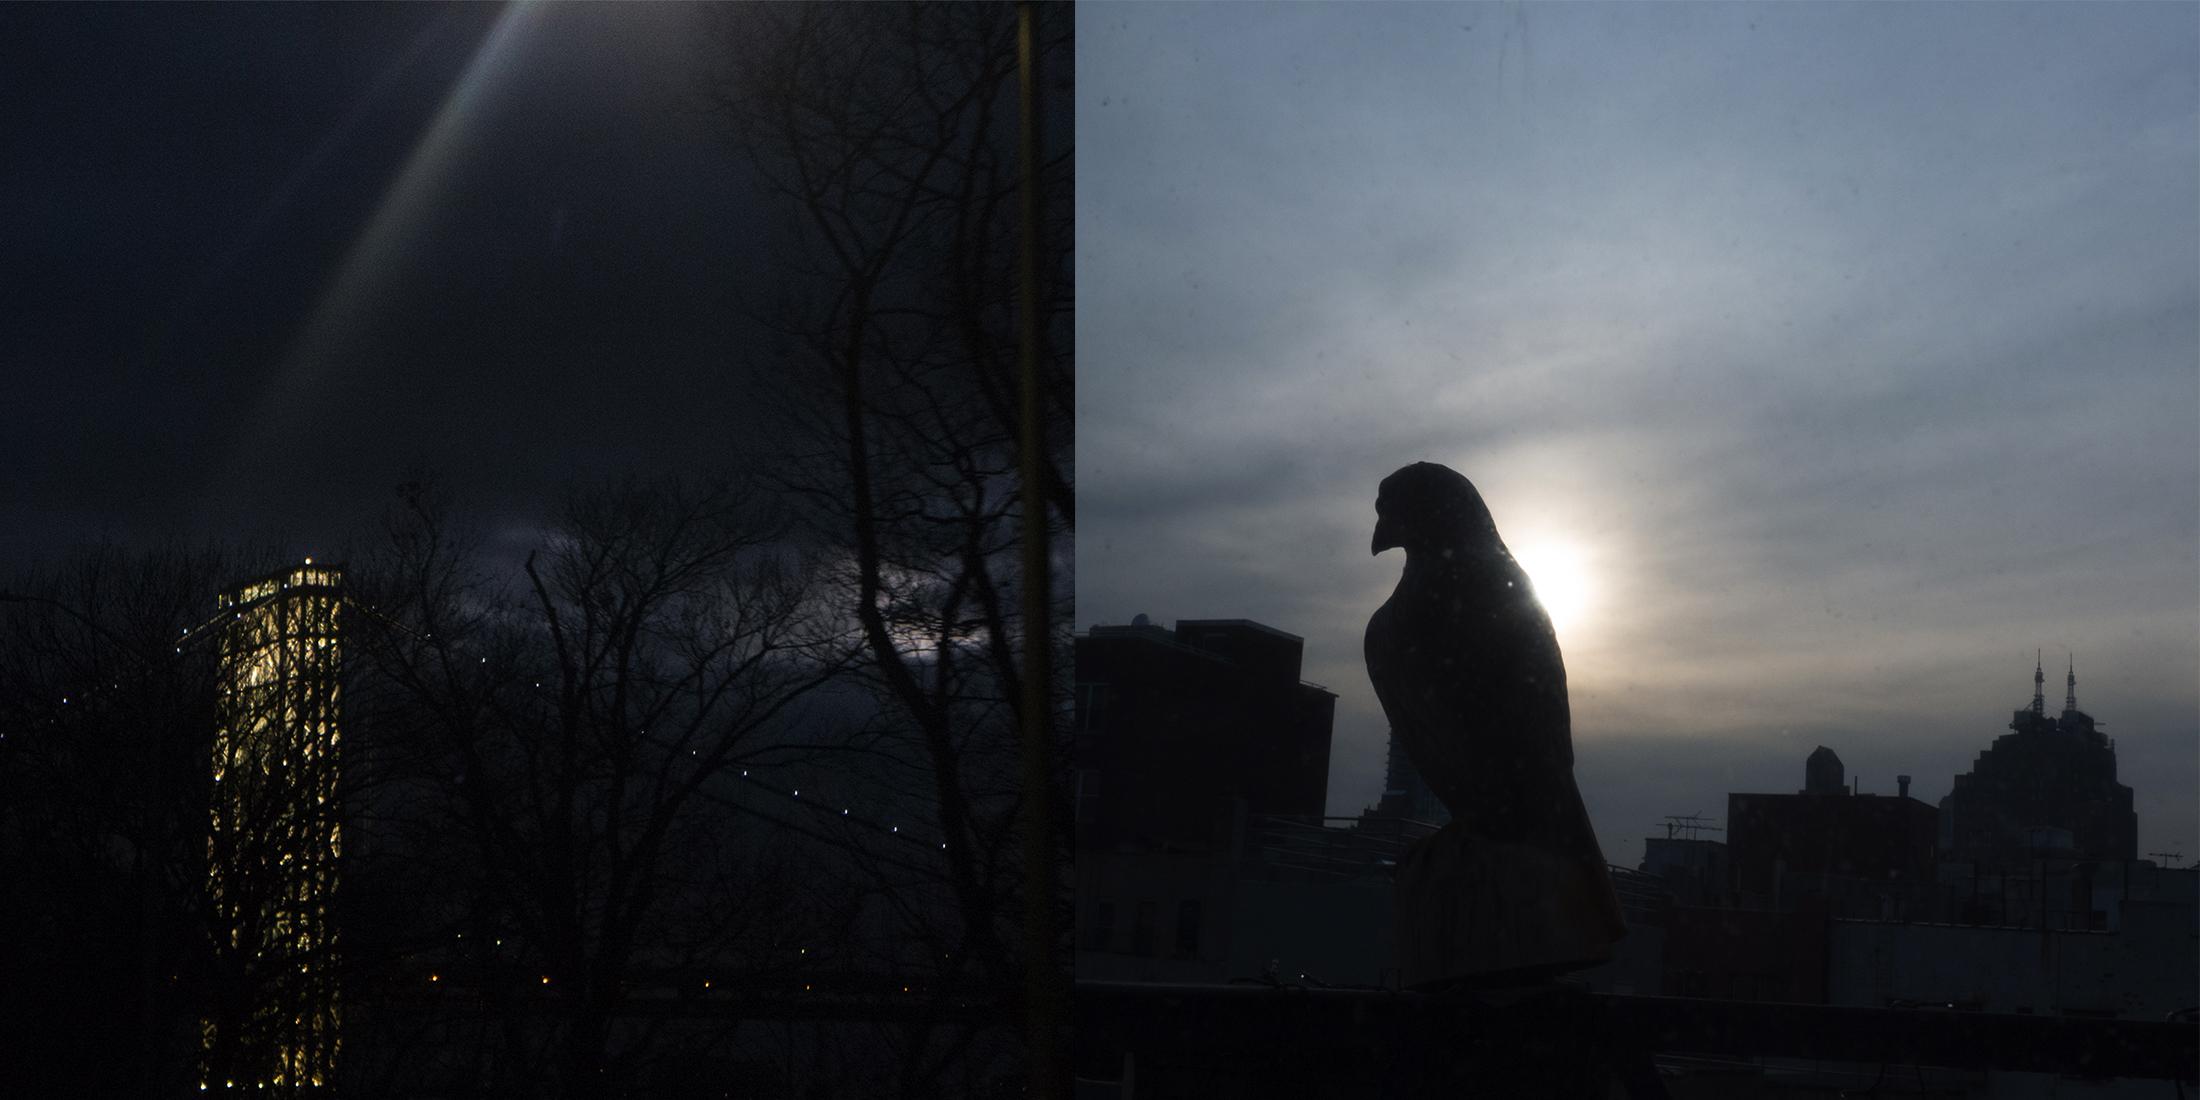 GWB at Night/Pigeon, Chinatown